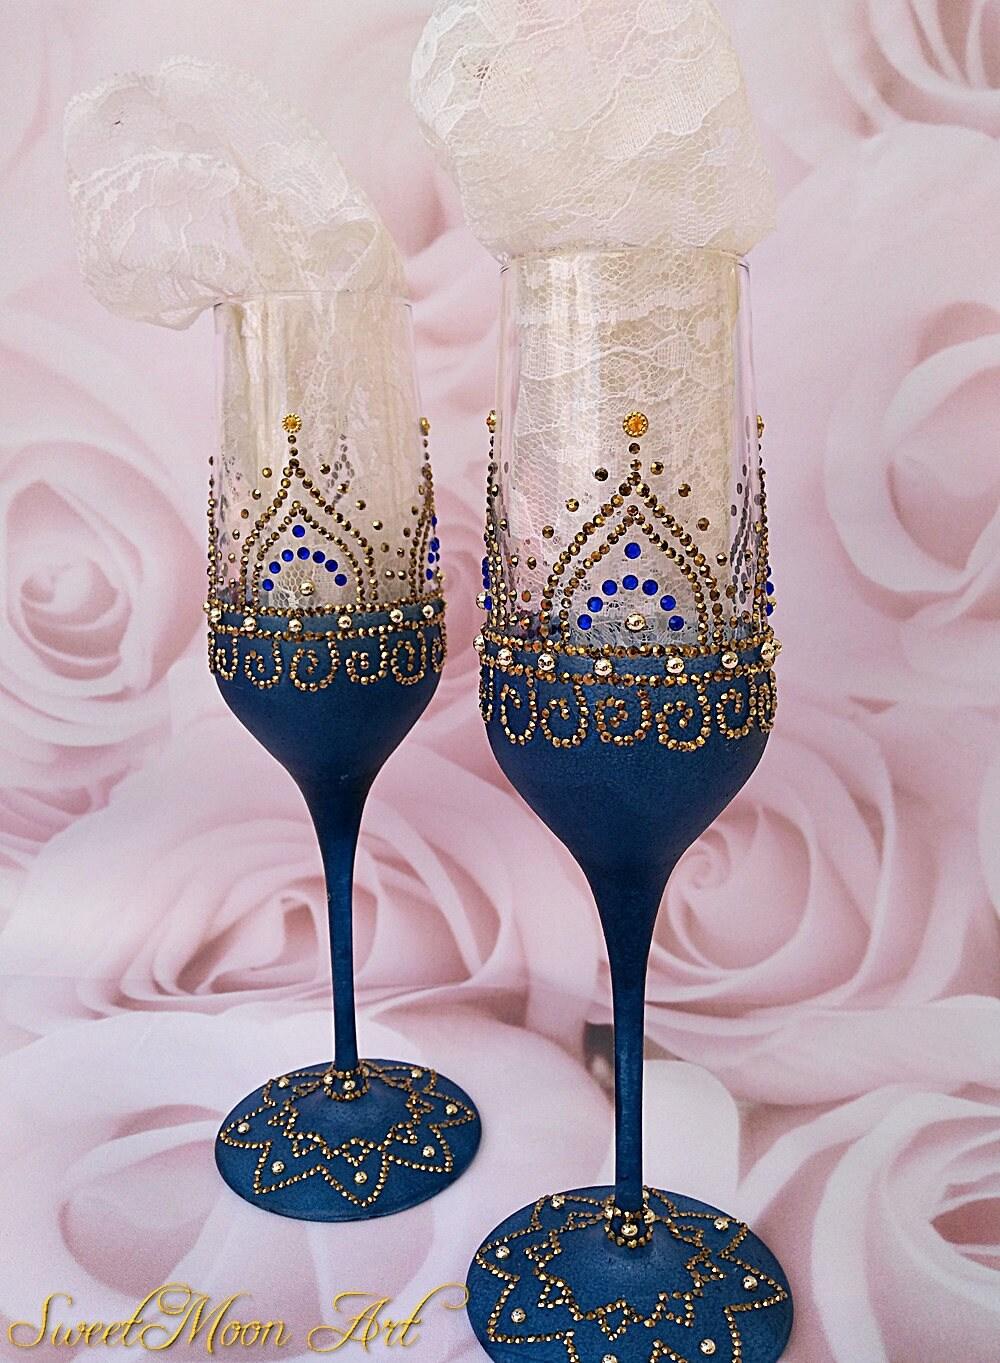 Copas Champagne Azul Copas Doradas Copas Para Boda Copas # Champagne Muebles Uy